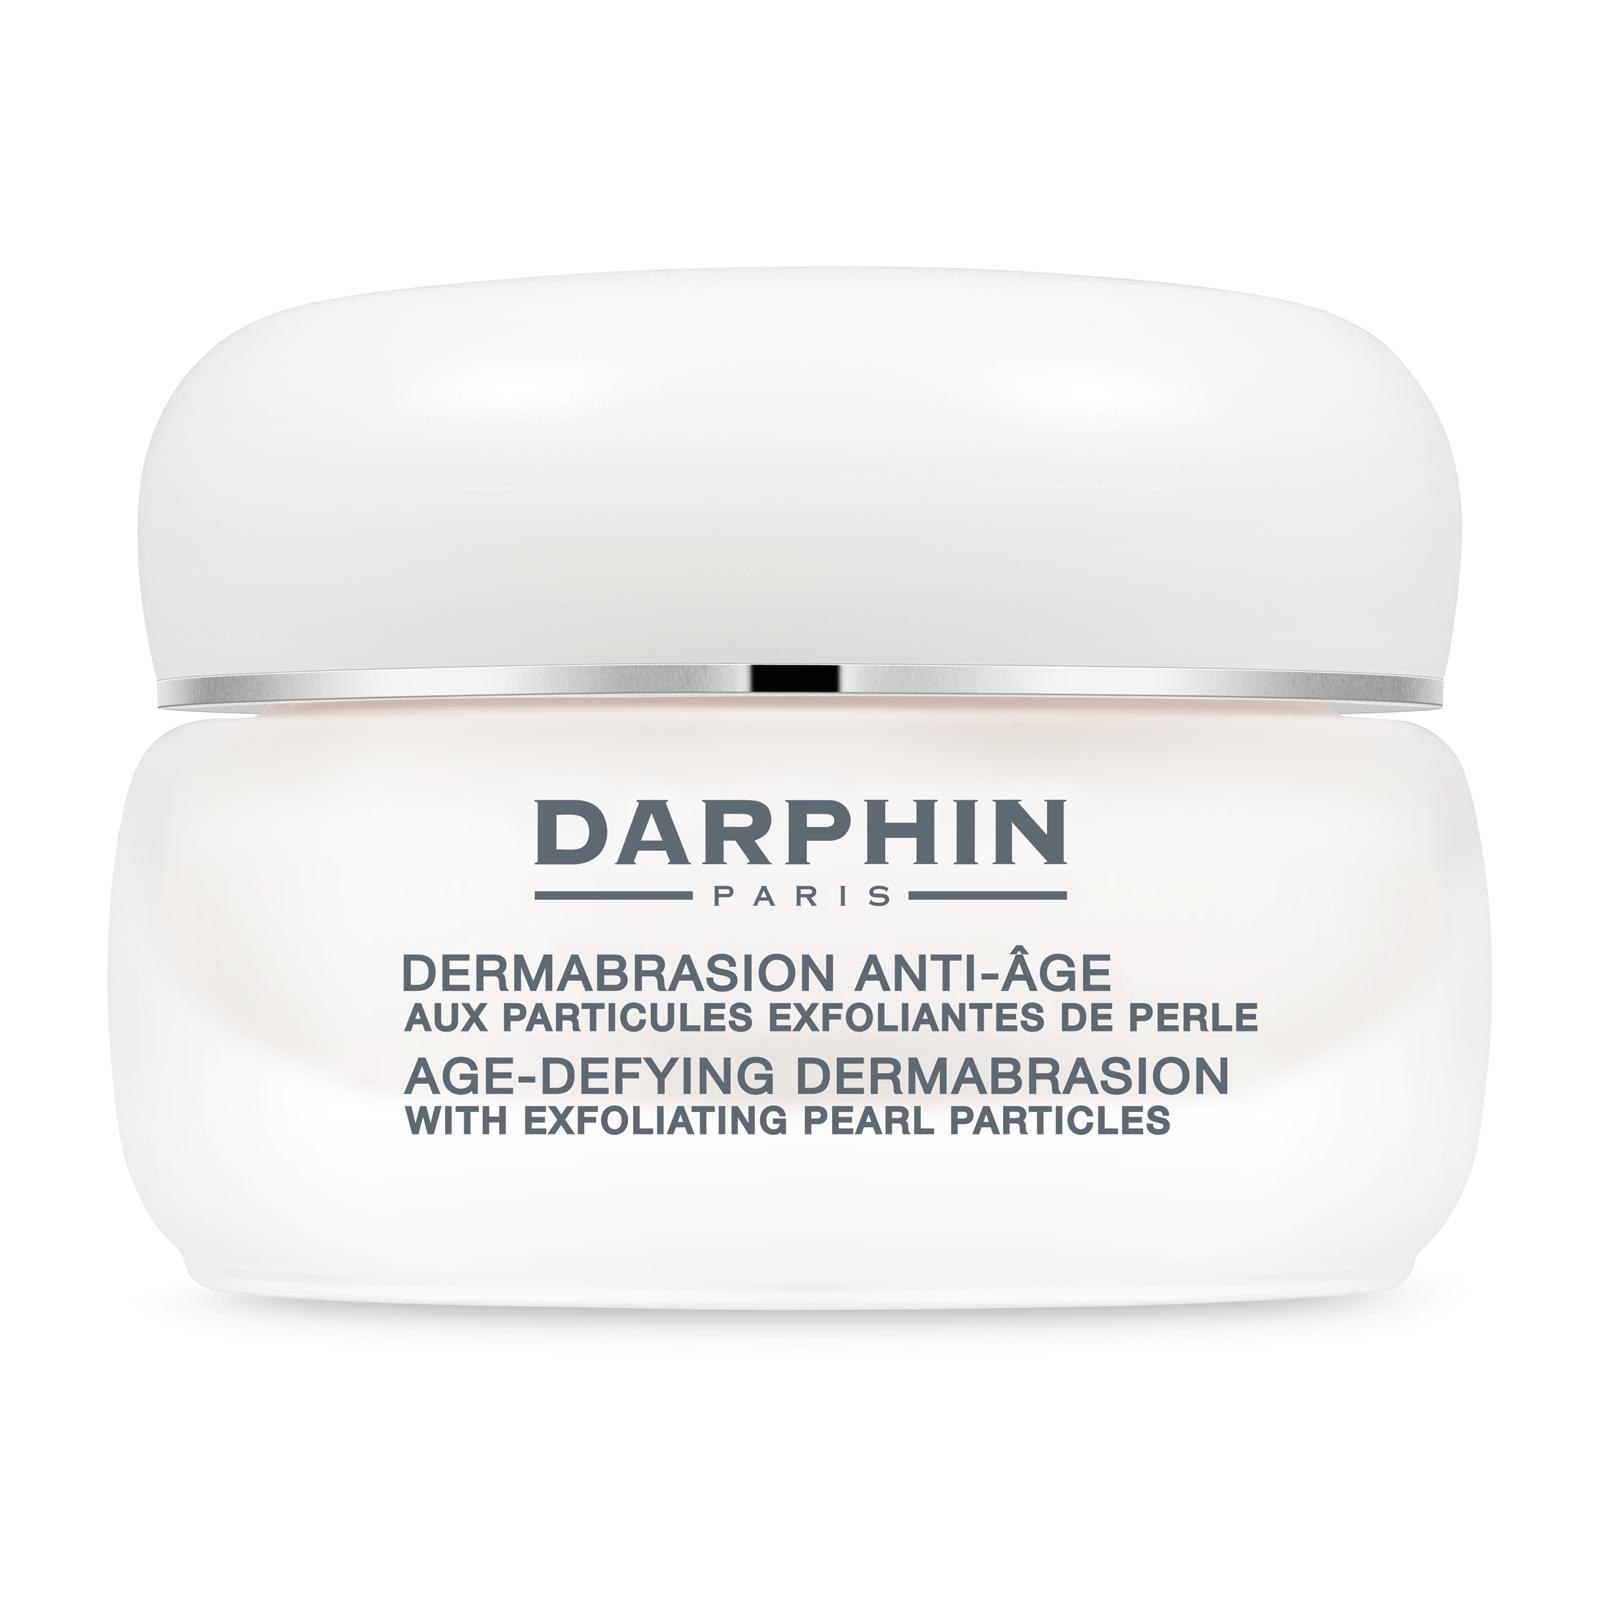 DARPHIN Age-Defying Dermabrasion 50ml